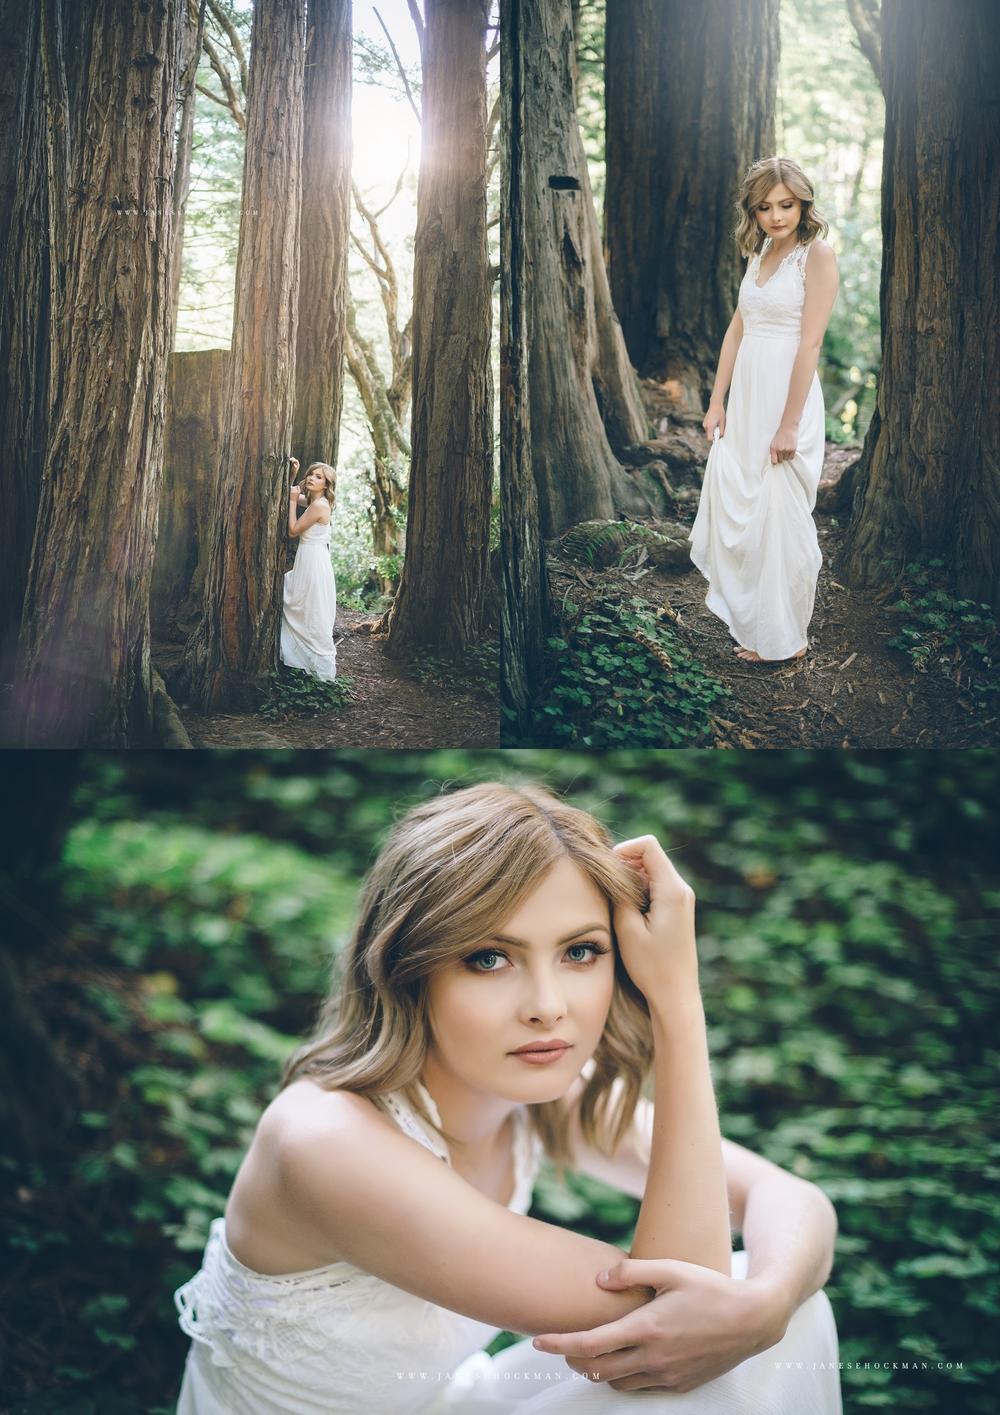 Janese Hockman Photography San Luis Obispo California High School Senior Photography 9.jpg